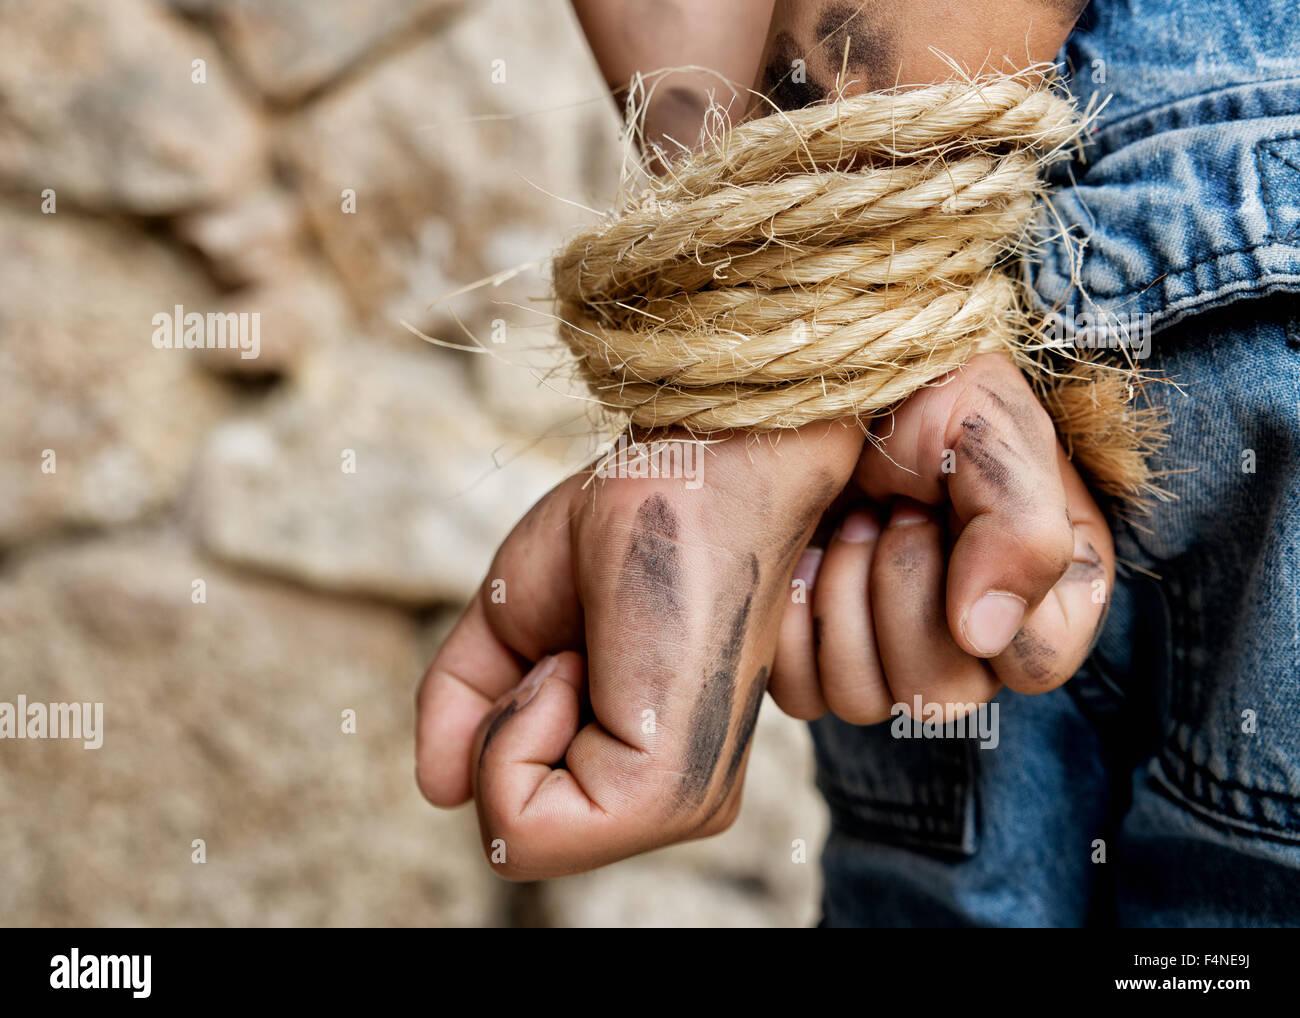 Prisoner bound with rope - Stock Image